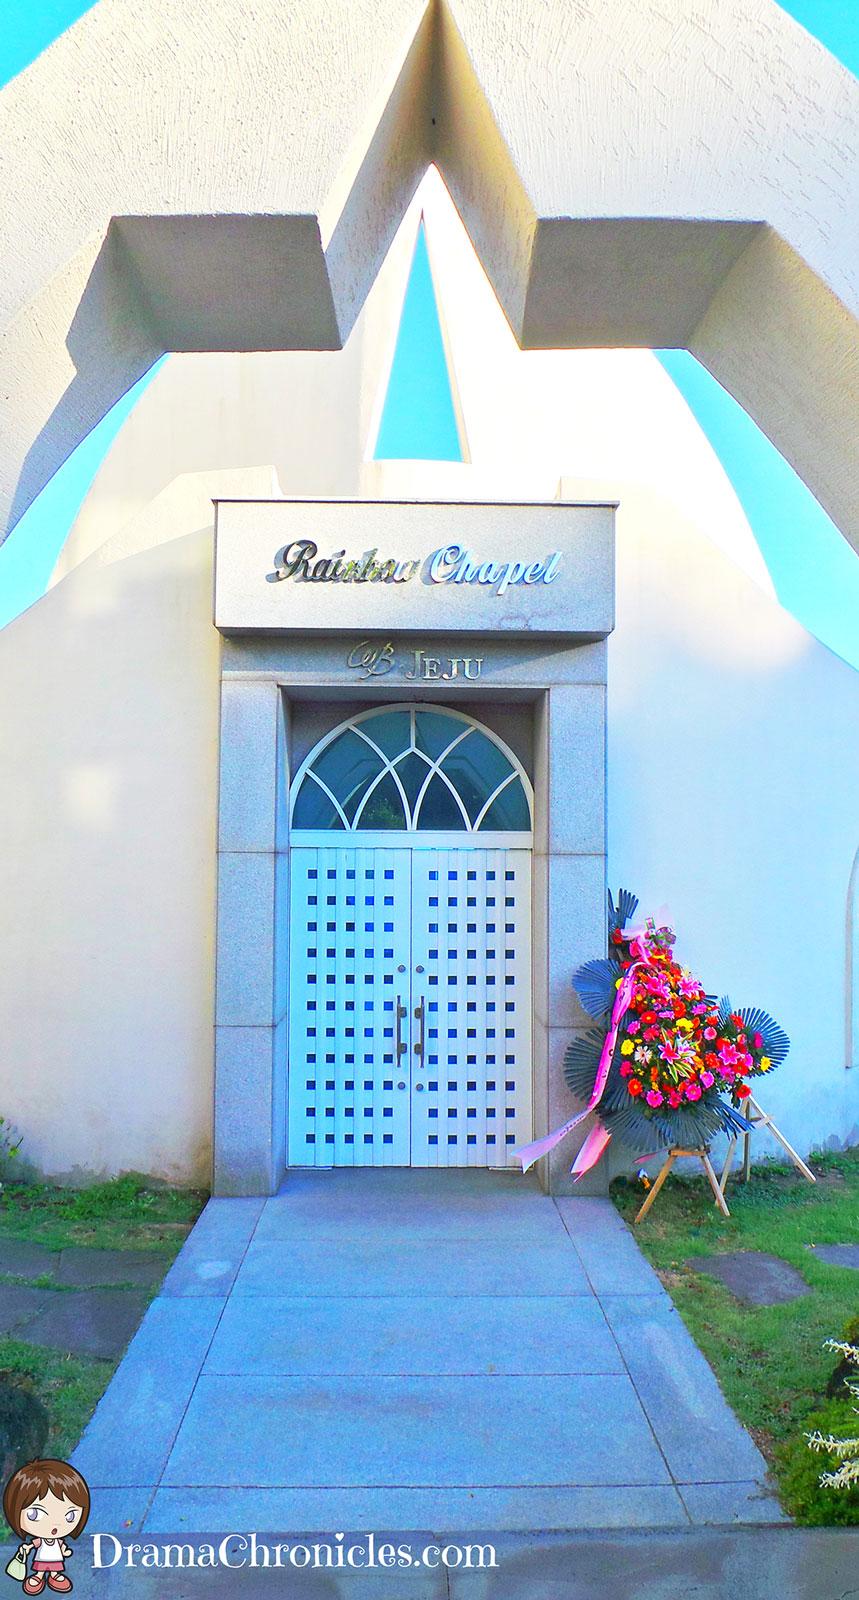 hyatt-regency-chapel-15-drama-chronicles